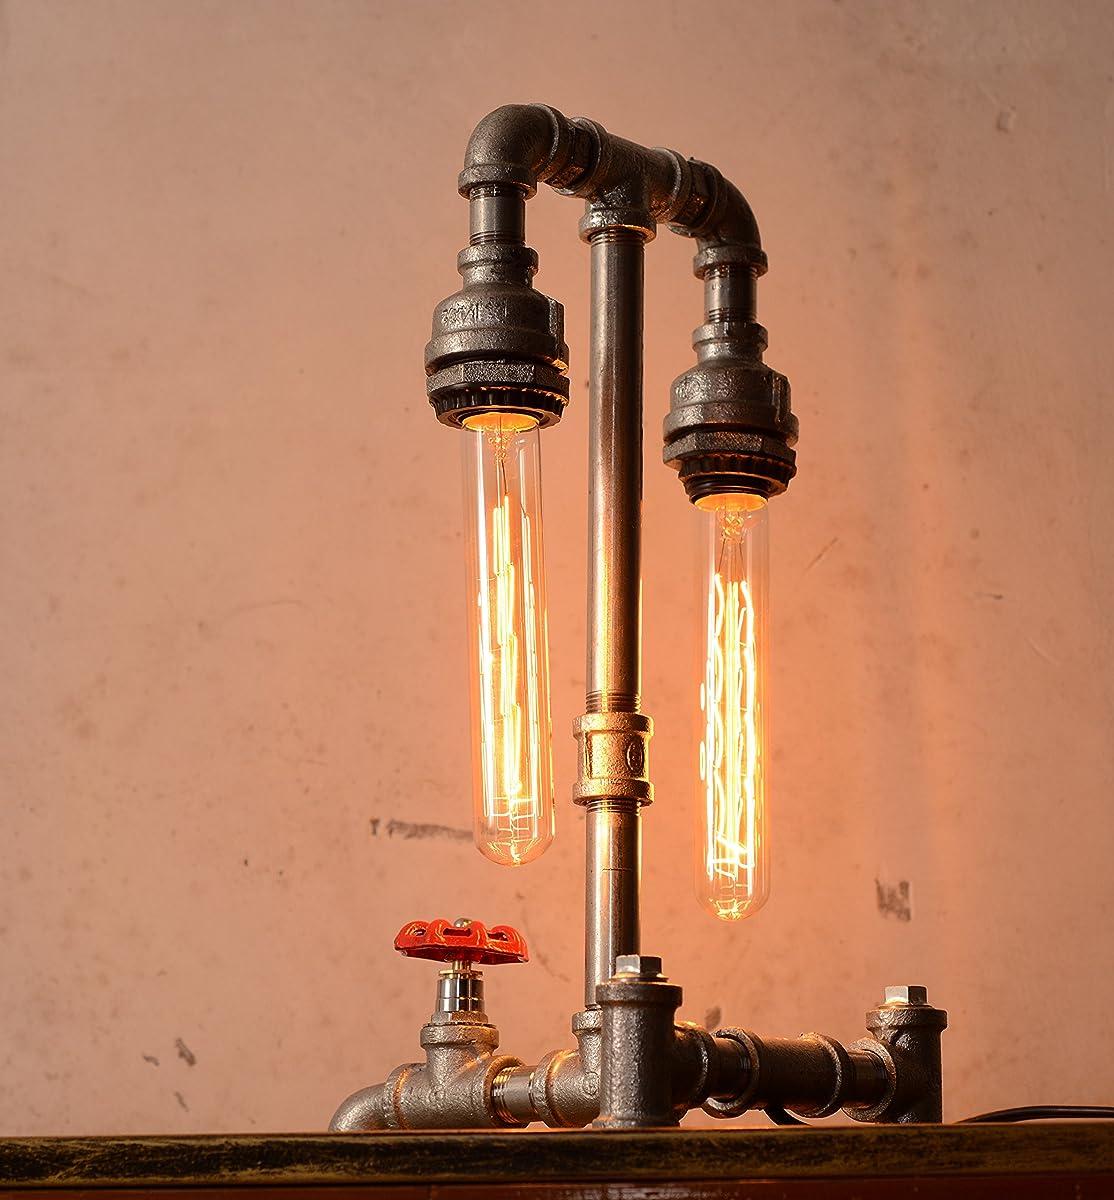 Designer Edison Vintage Style Industrial Steampunk Craftsmanship Interior Retro Pipe Table / Desk / Bedside Lamp (Double Lights)